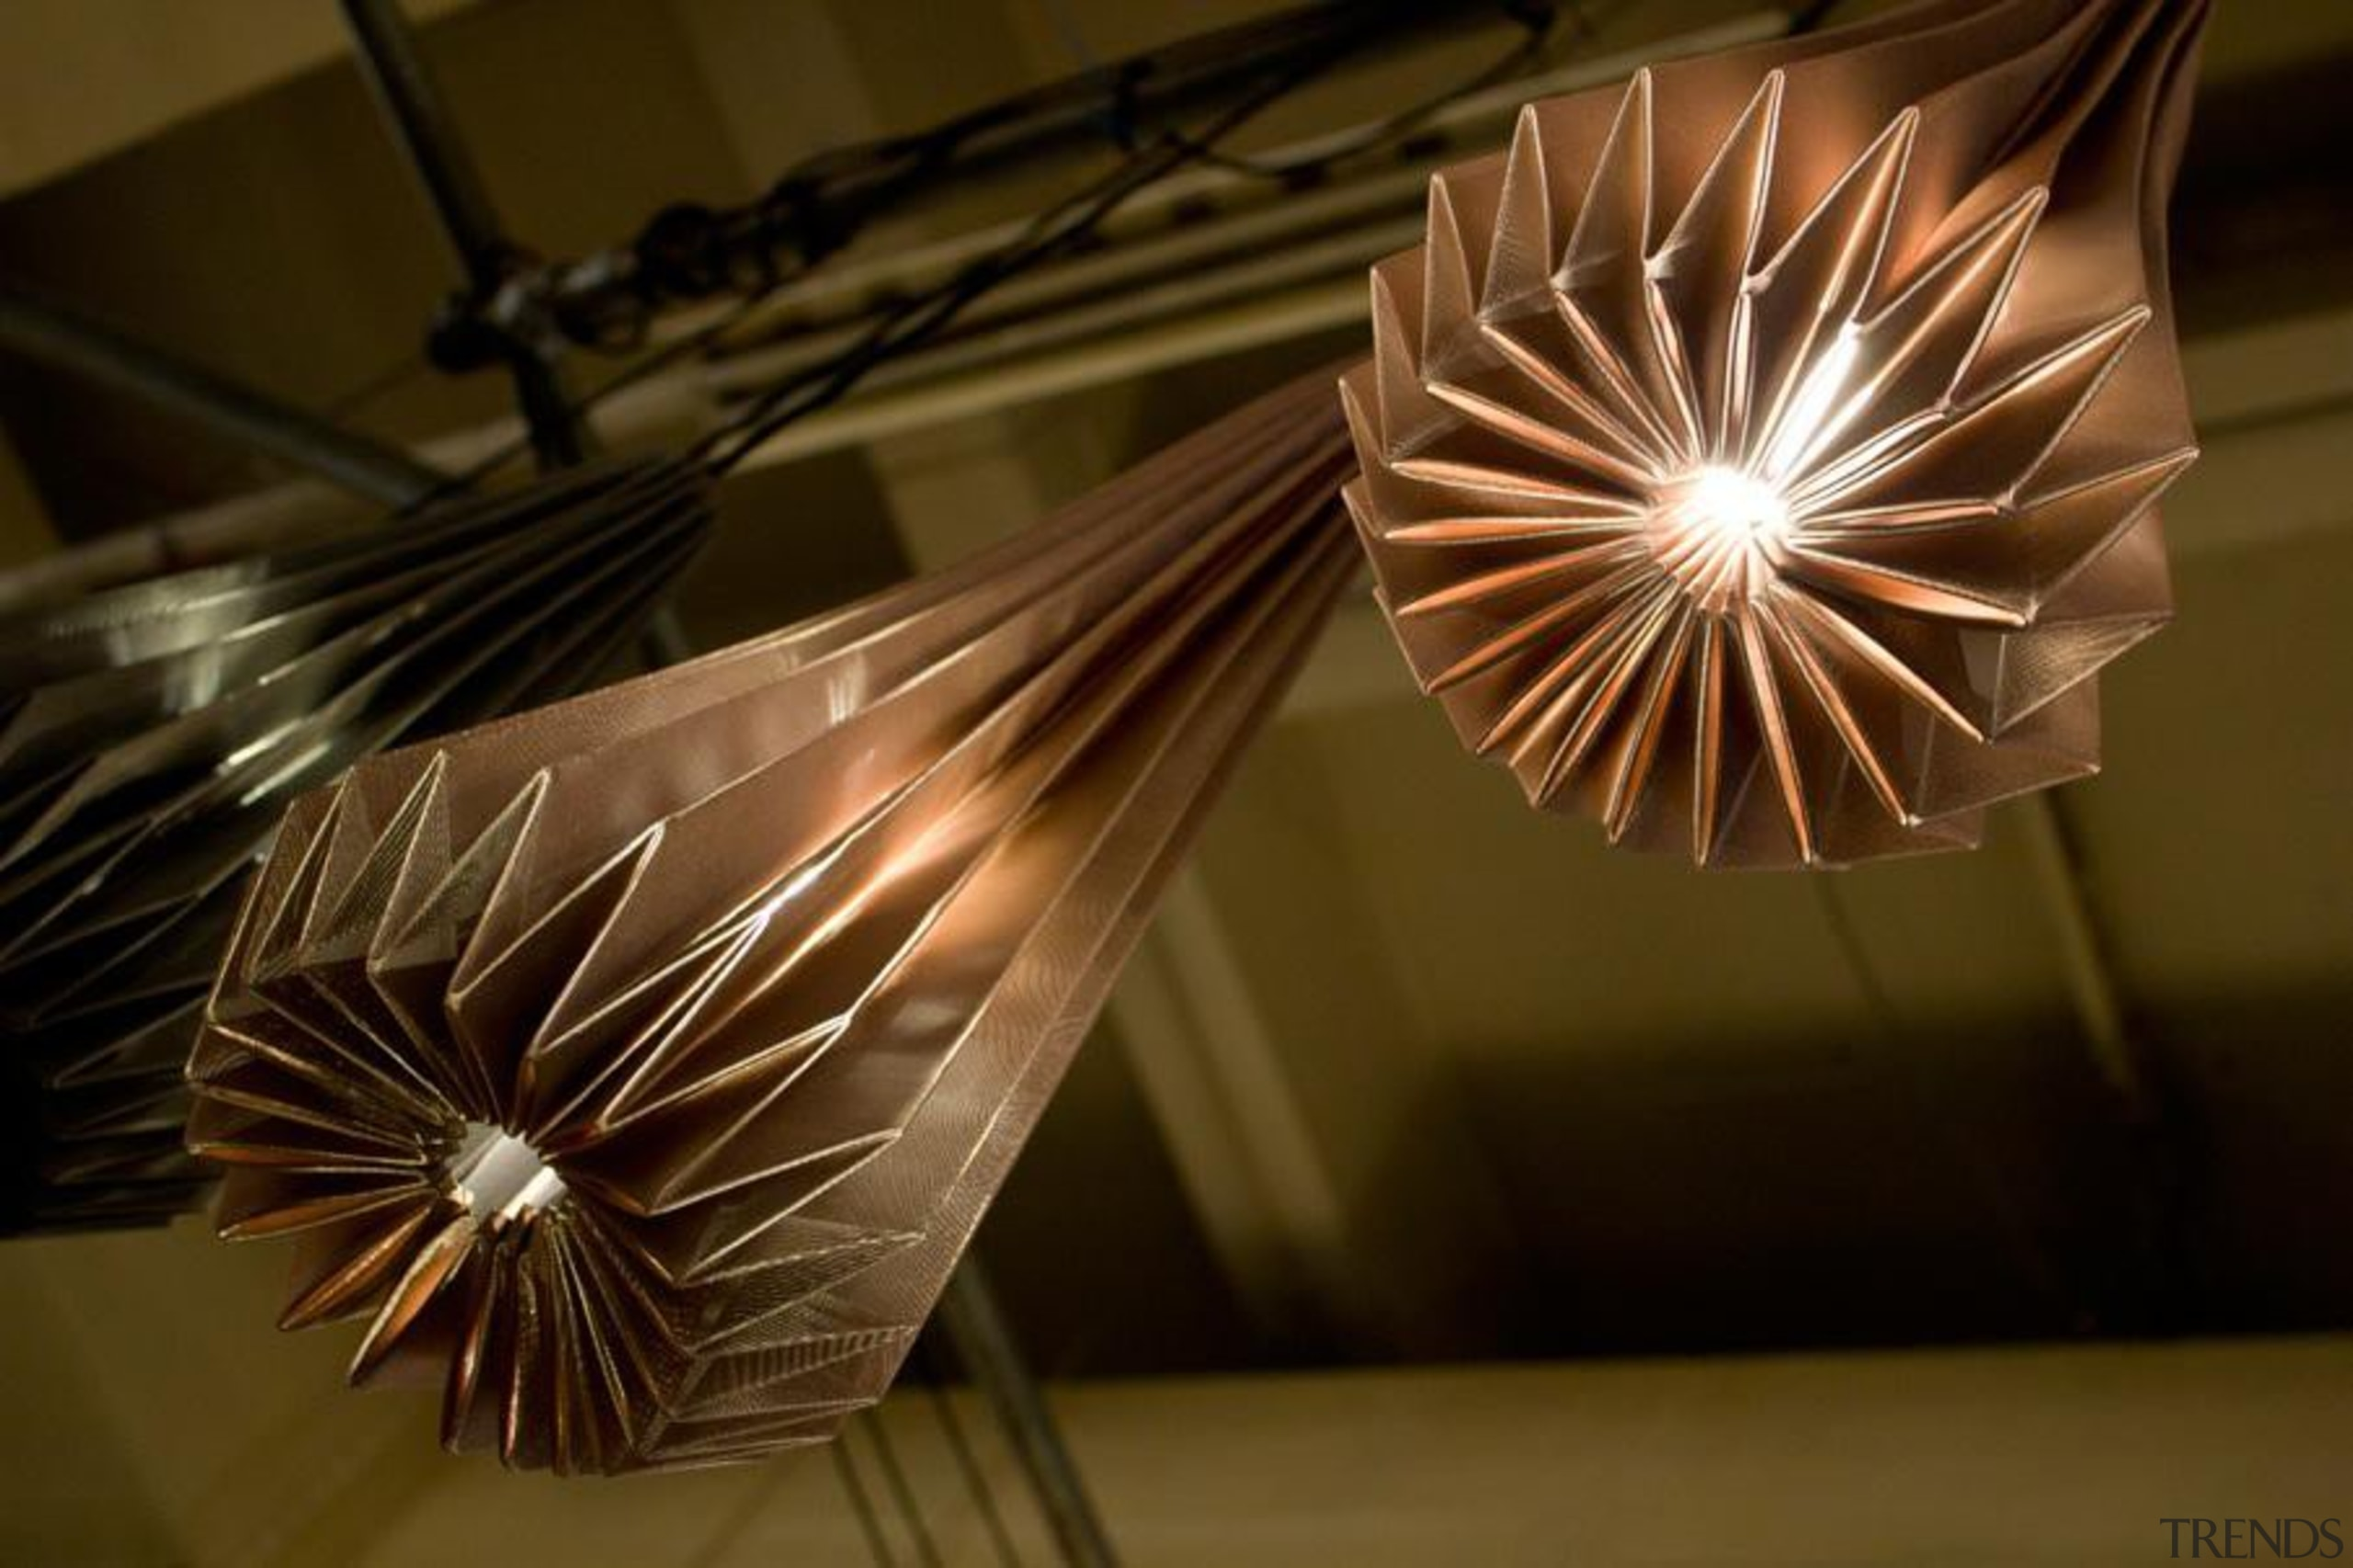 A range of folded metallic fabrics  are light, light fixture, lighting, lighting accessory, wood, brown